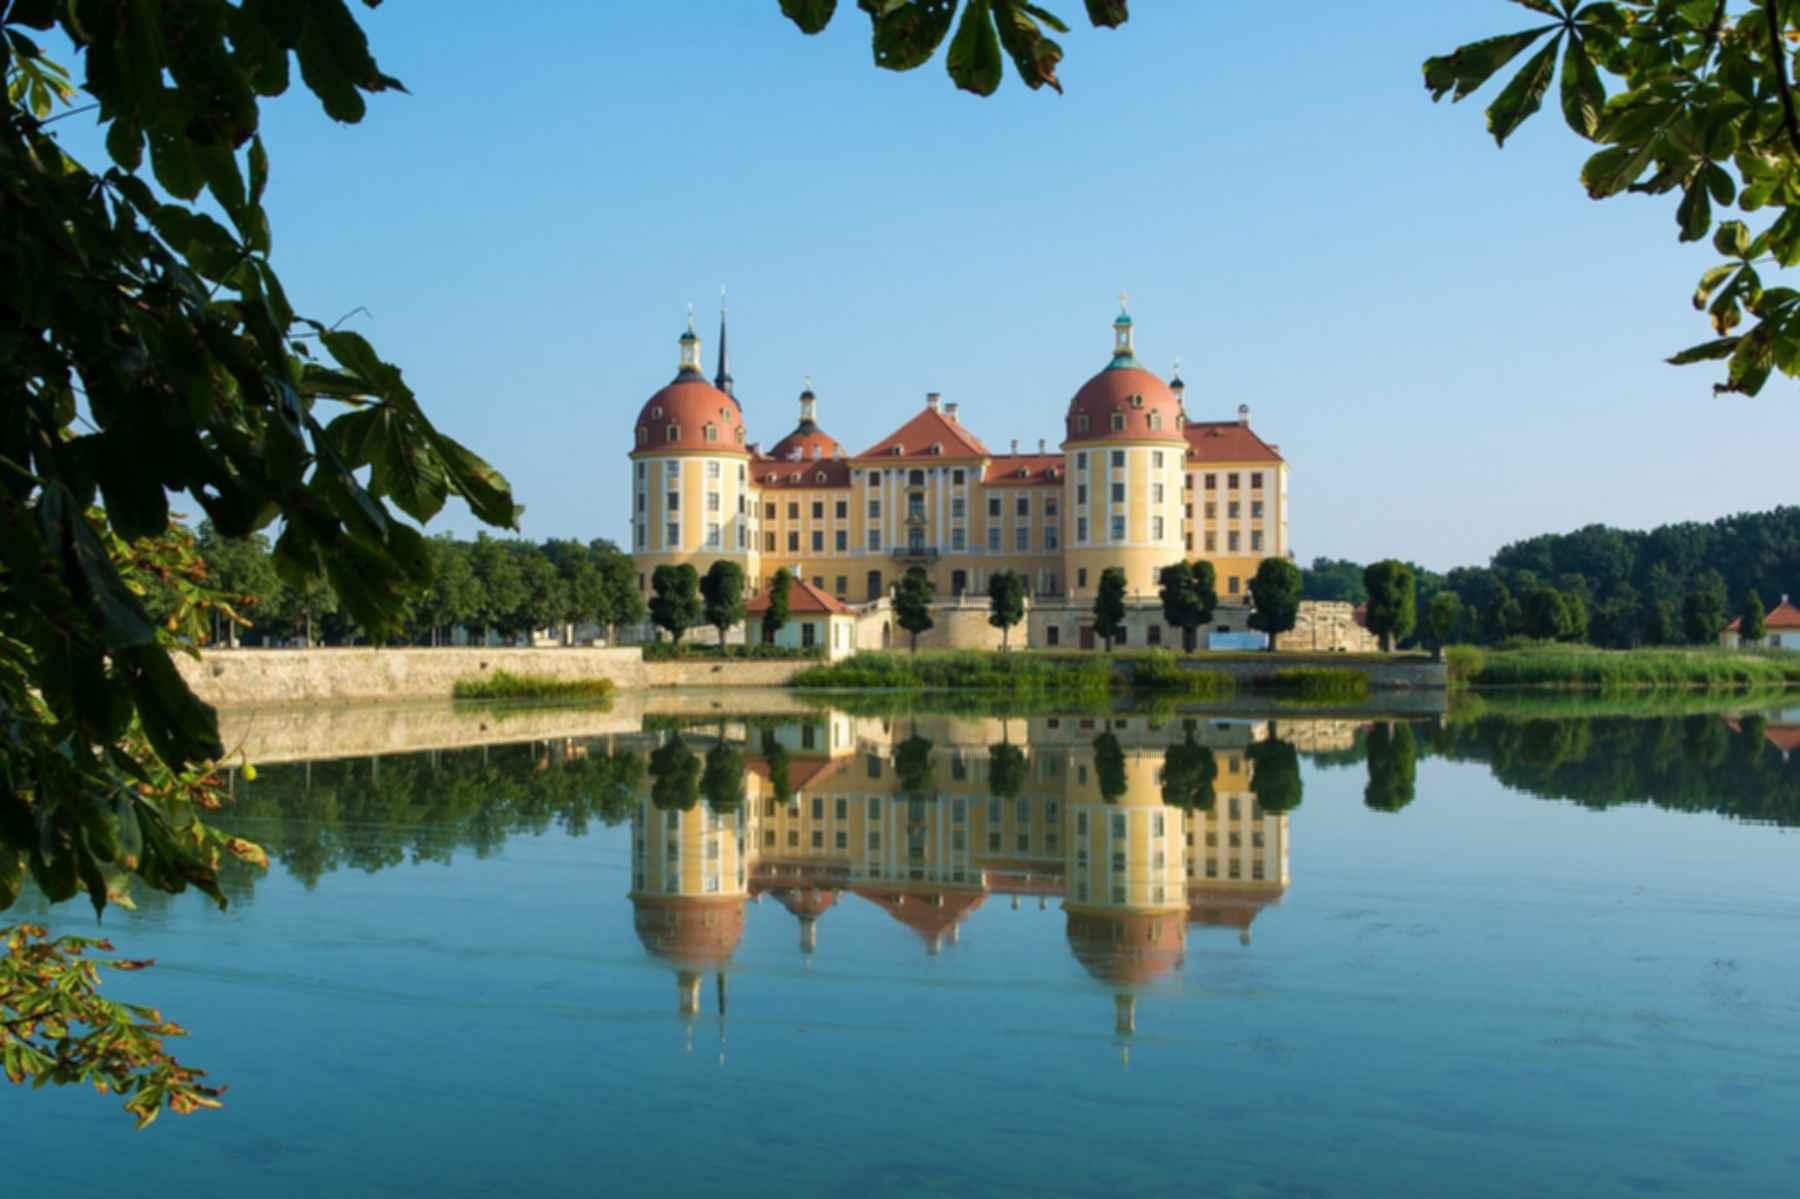 Moritzburg Castle - Exterior